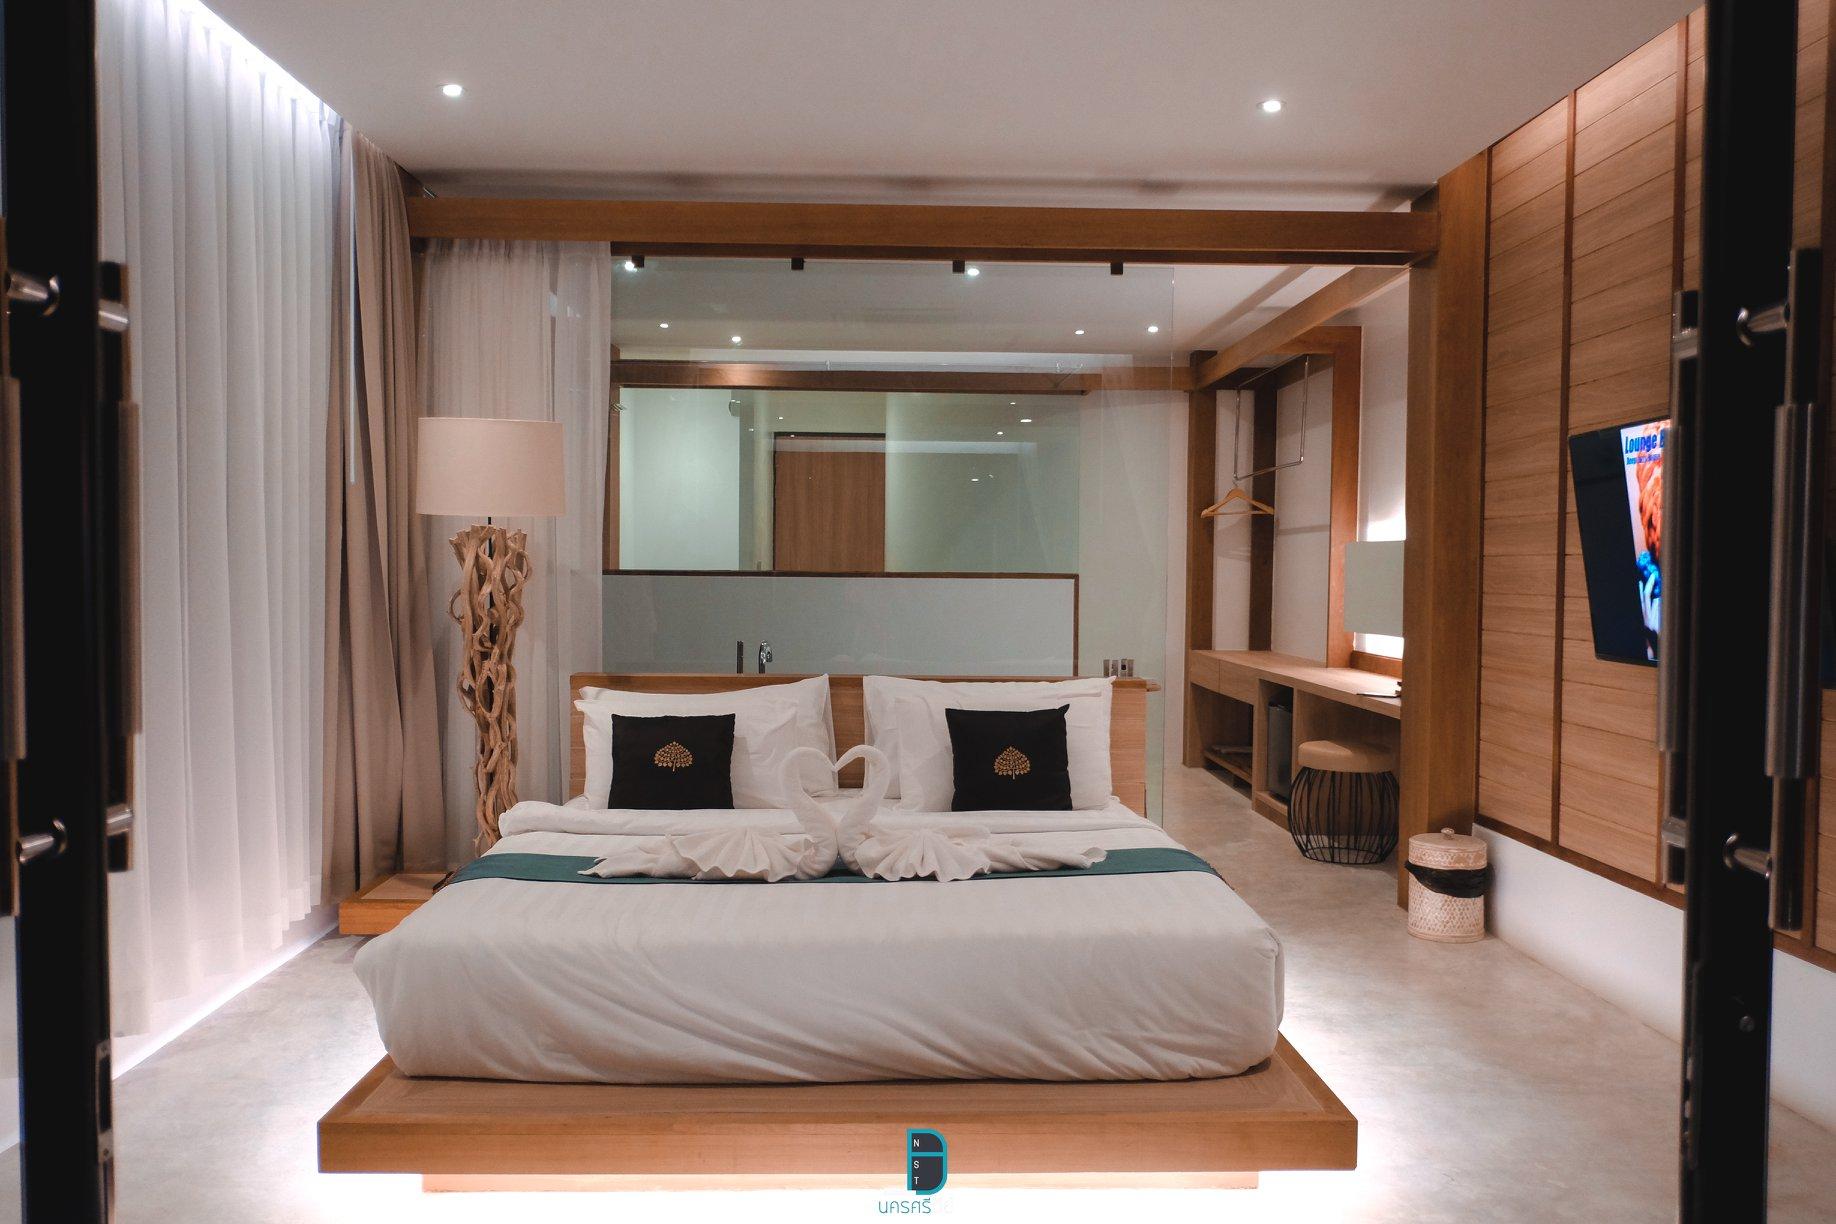 4.-Sichon-Cabana-Beach-Resort คลิกที่นี่ ที่พัก,นครศรีธรรมราช,เที่ยว,เมืองคอน,วิวหลักล้าน,สวย